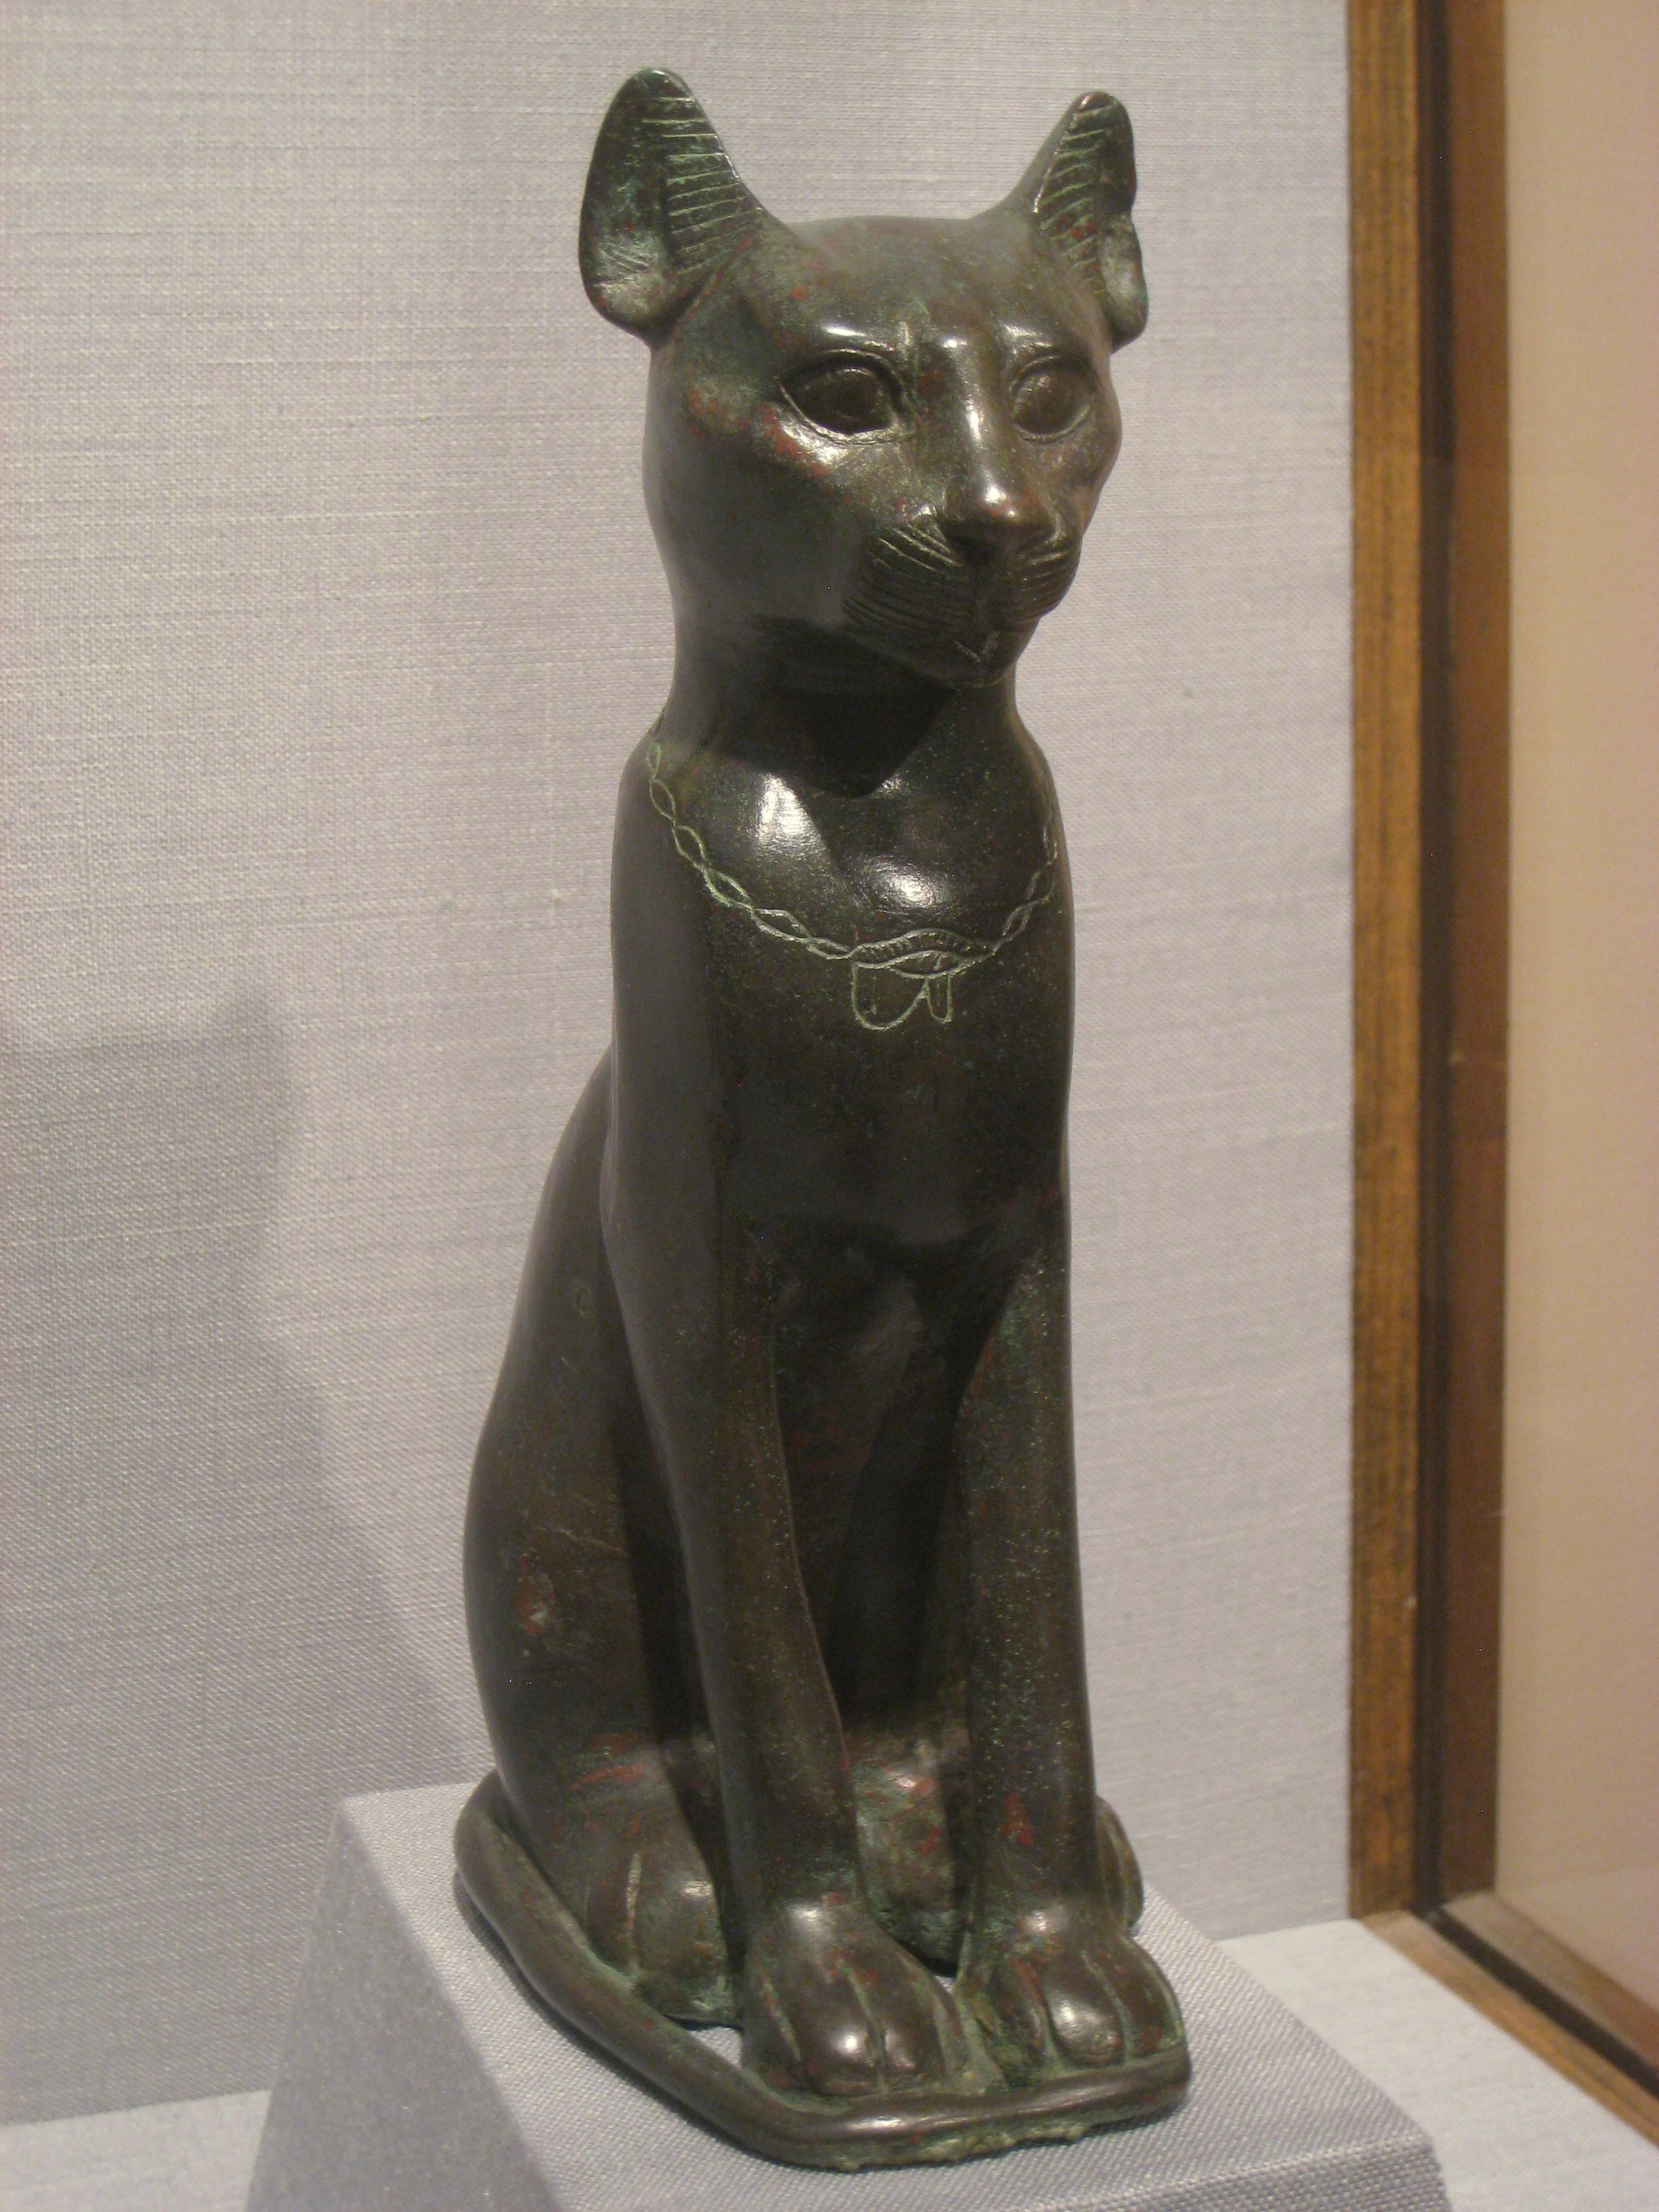 Cat, Eyptian Saite (663525 BC), bronze. Ancient